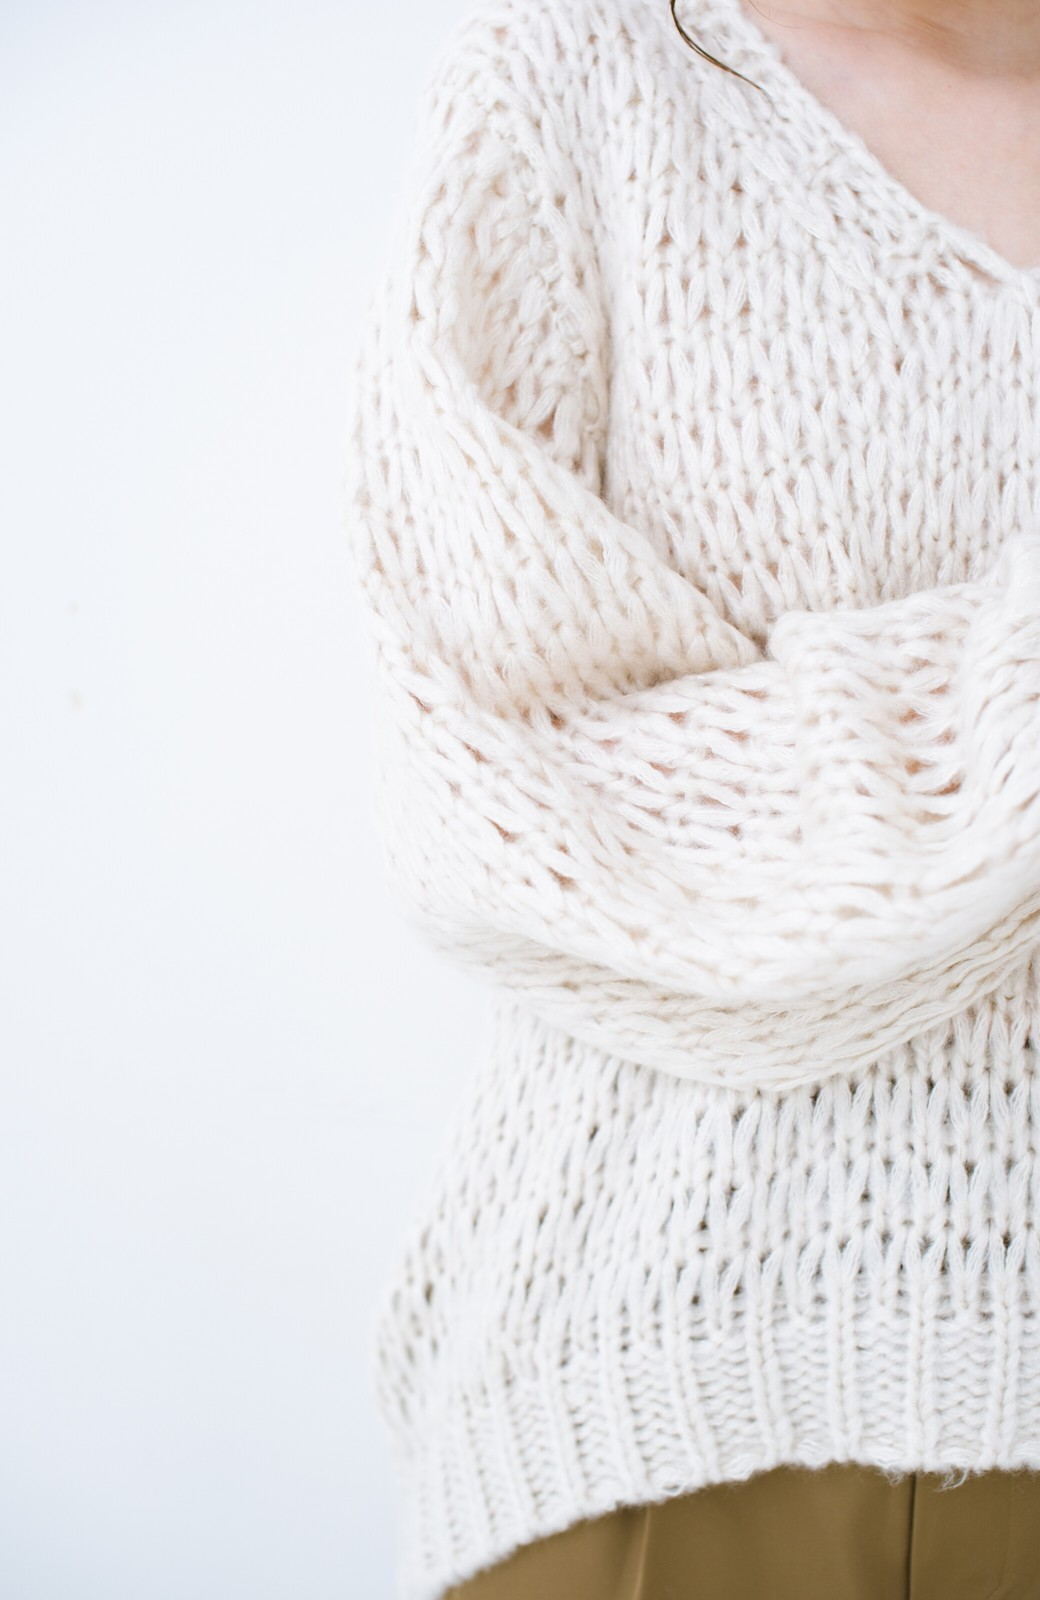 haco! 手編み風のざっくり感で女っぽい Vネックの甘編みルーズニット <アイボリー>の商品写真4